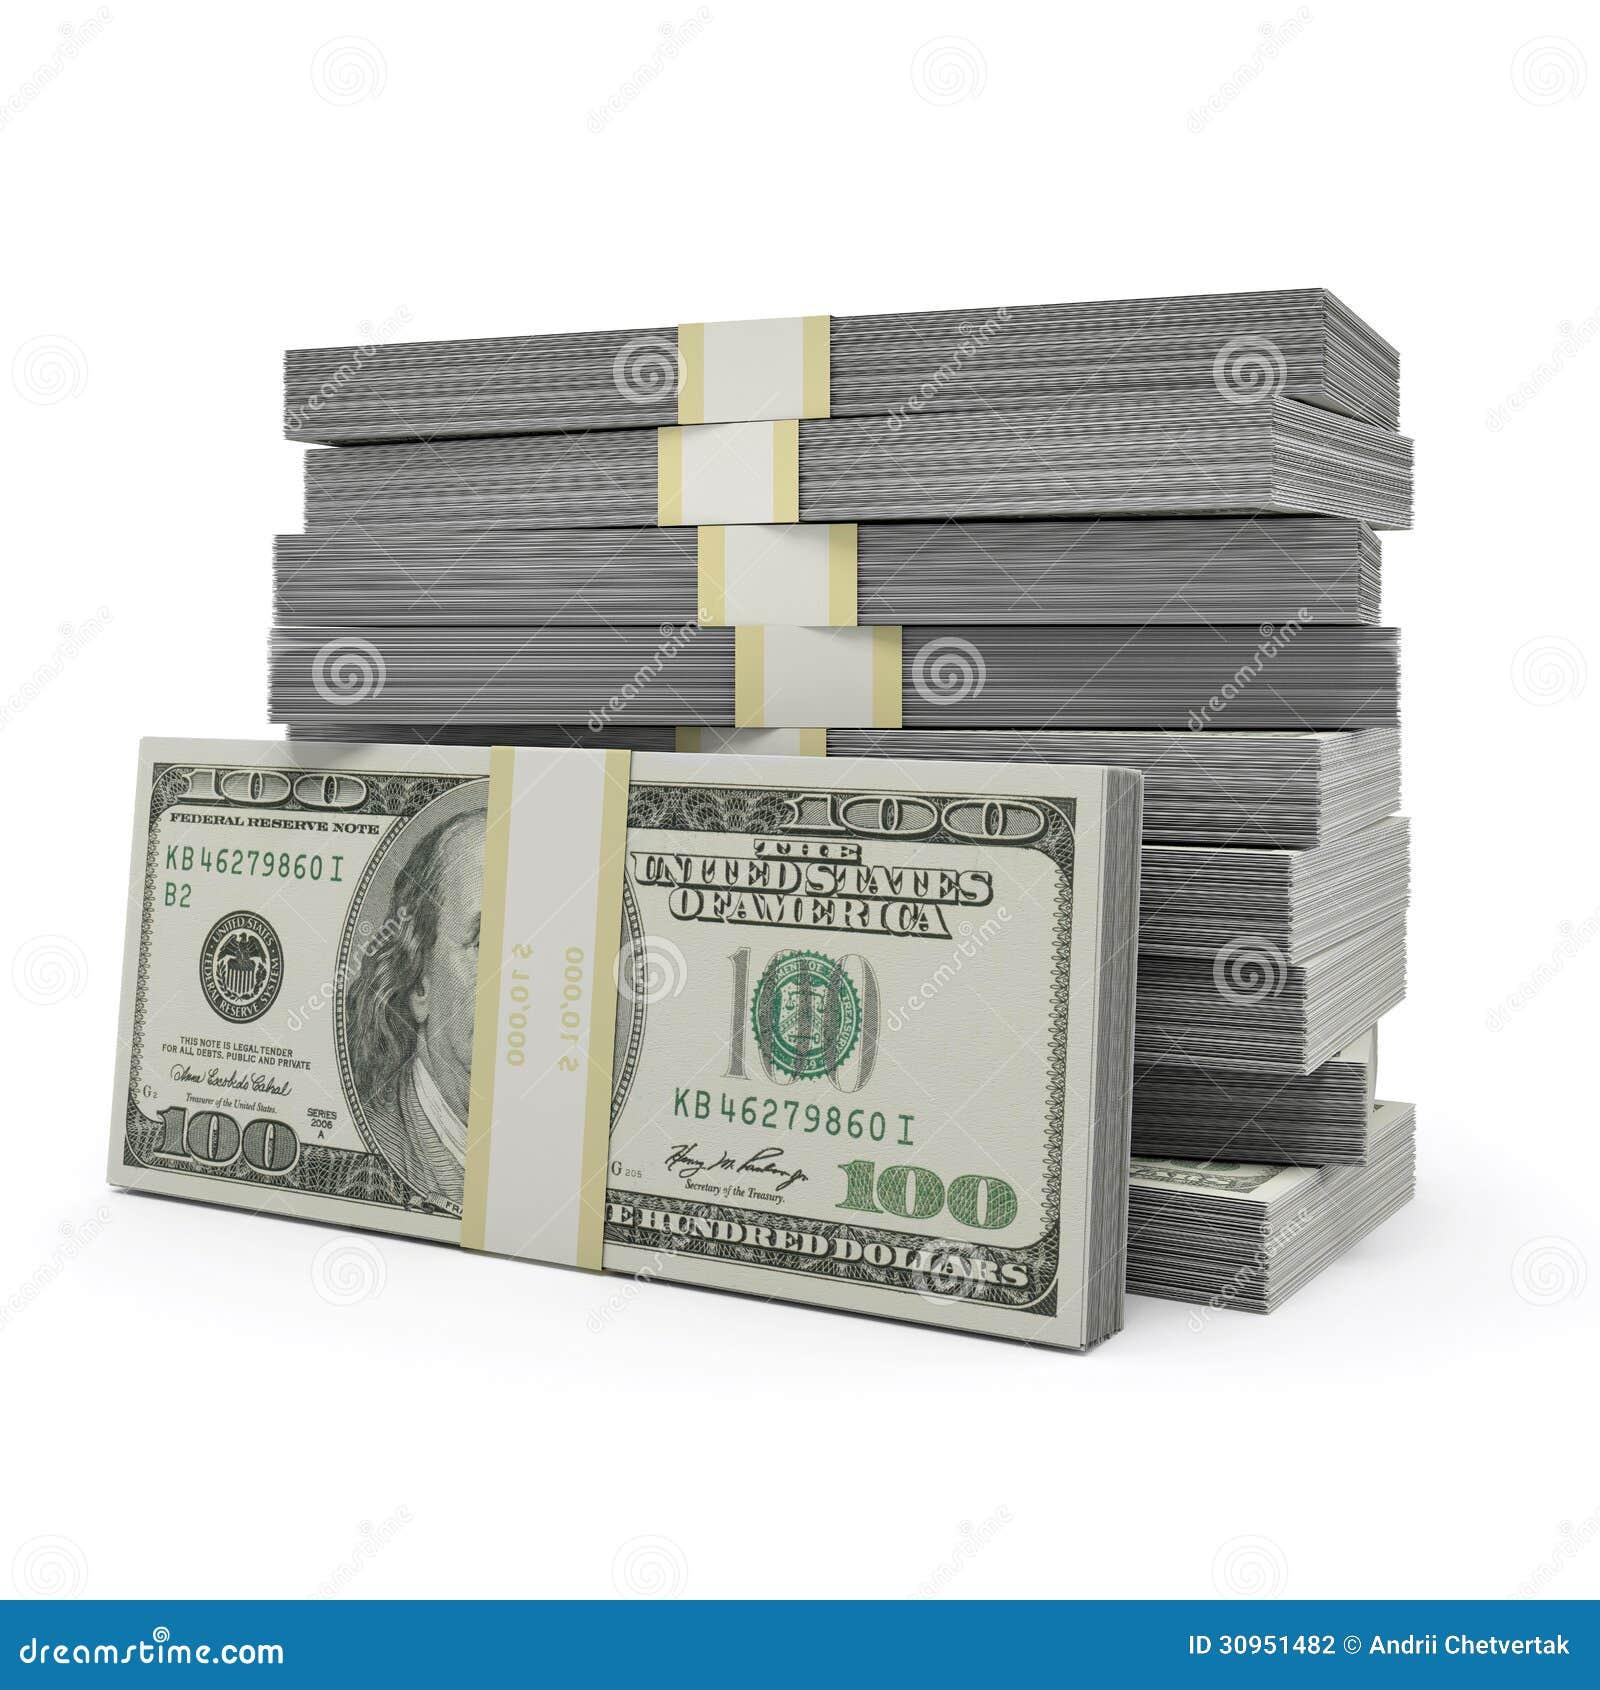 money stack stock photography image 30951482